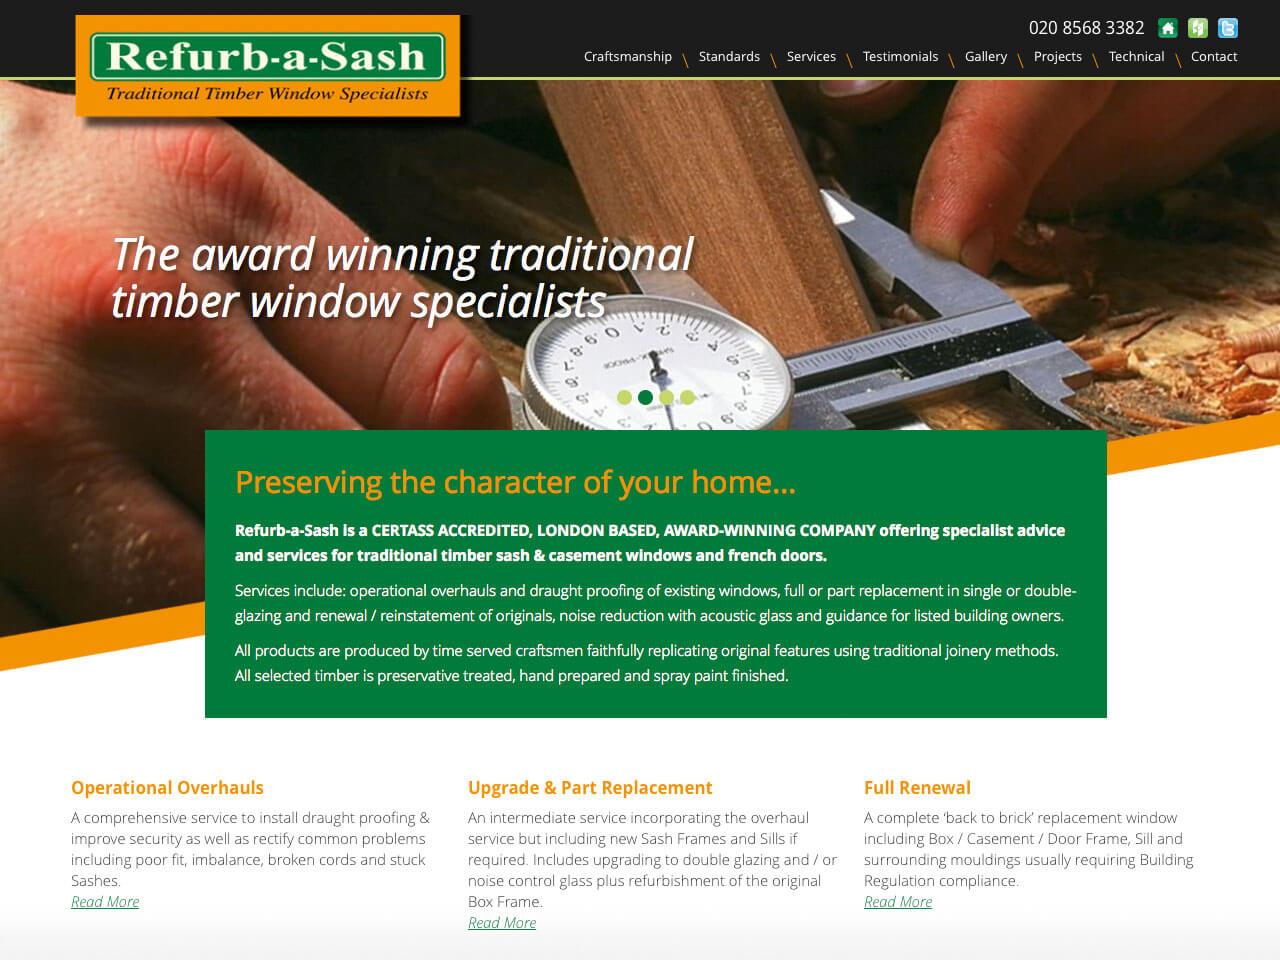 Spotlight On: Refurb-a-Sash